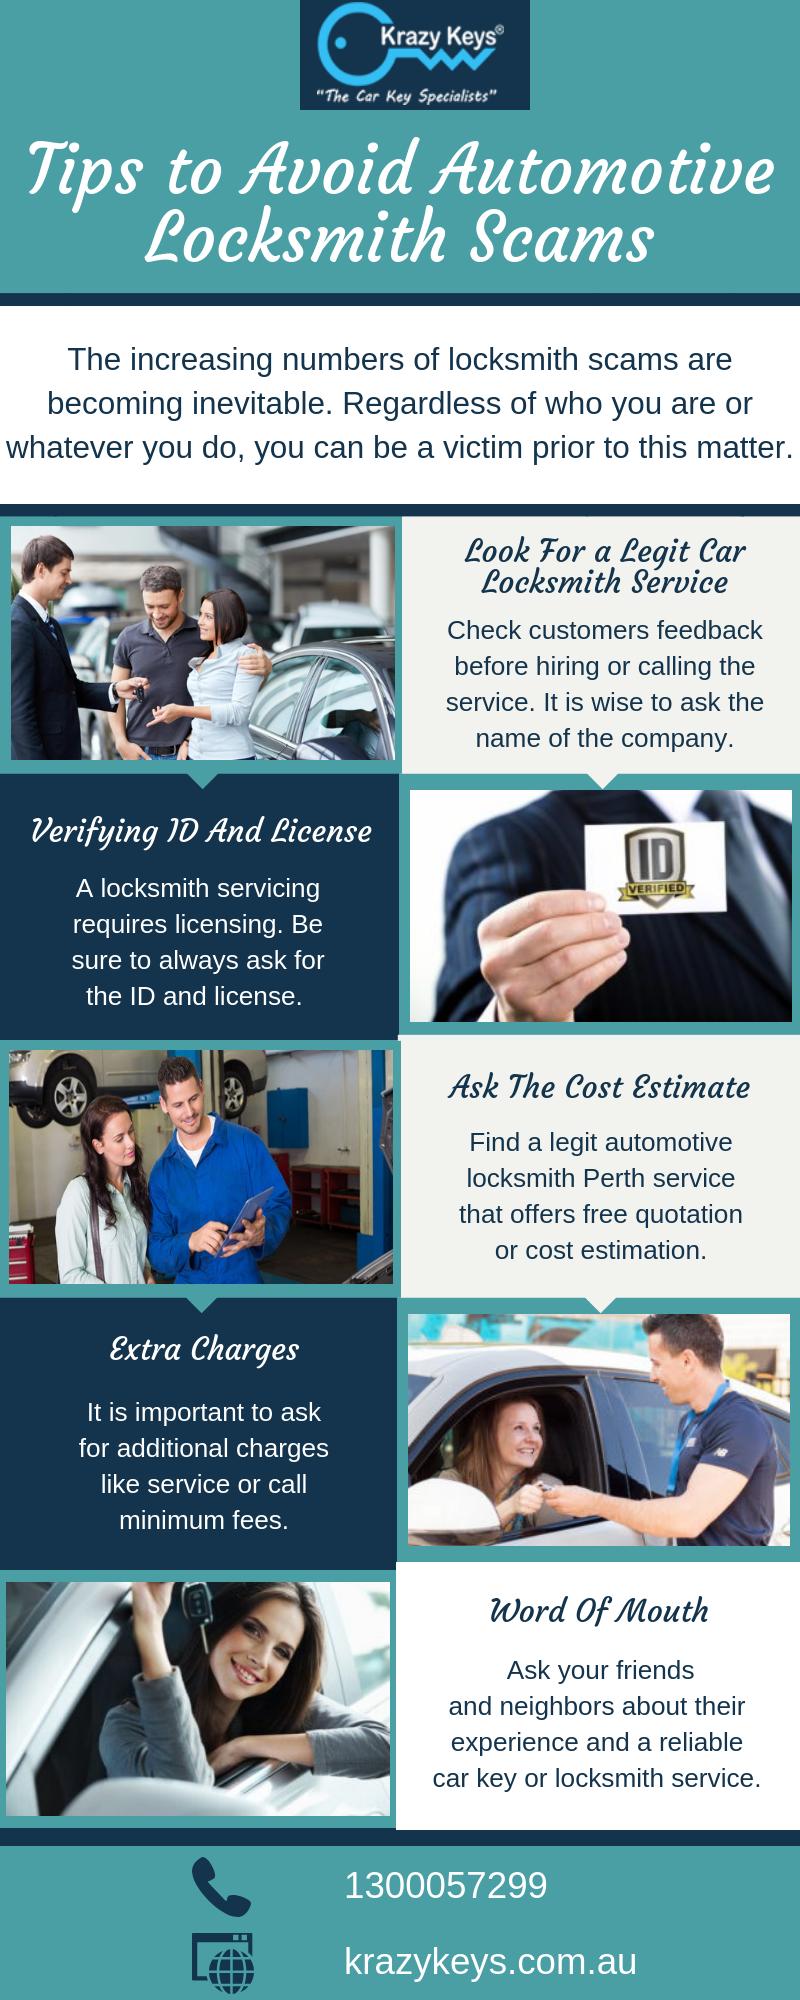 5 Tips to Avoid Automotive Locksmith Scams Automotive